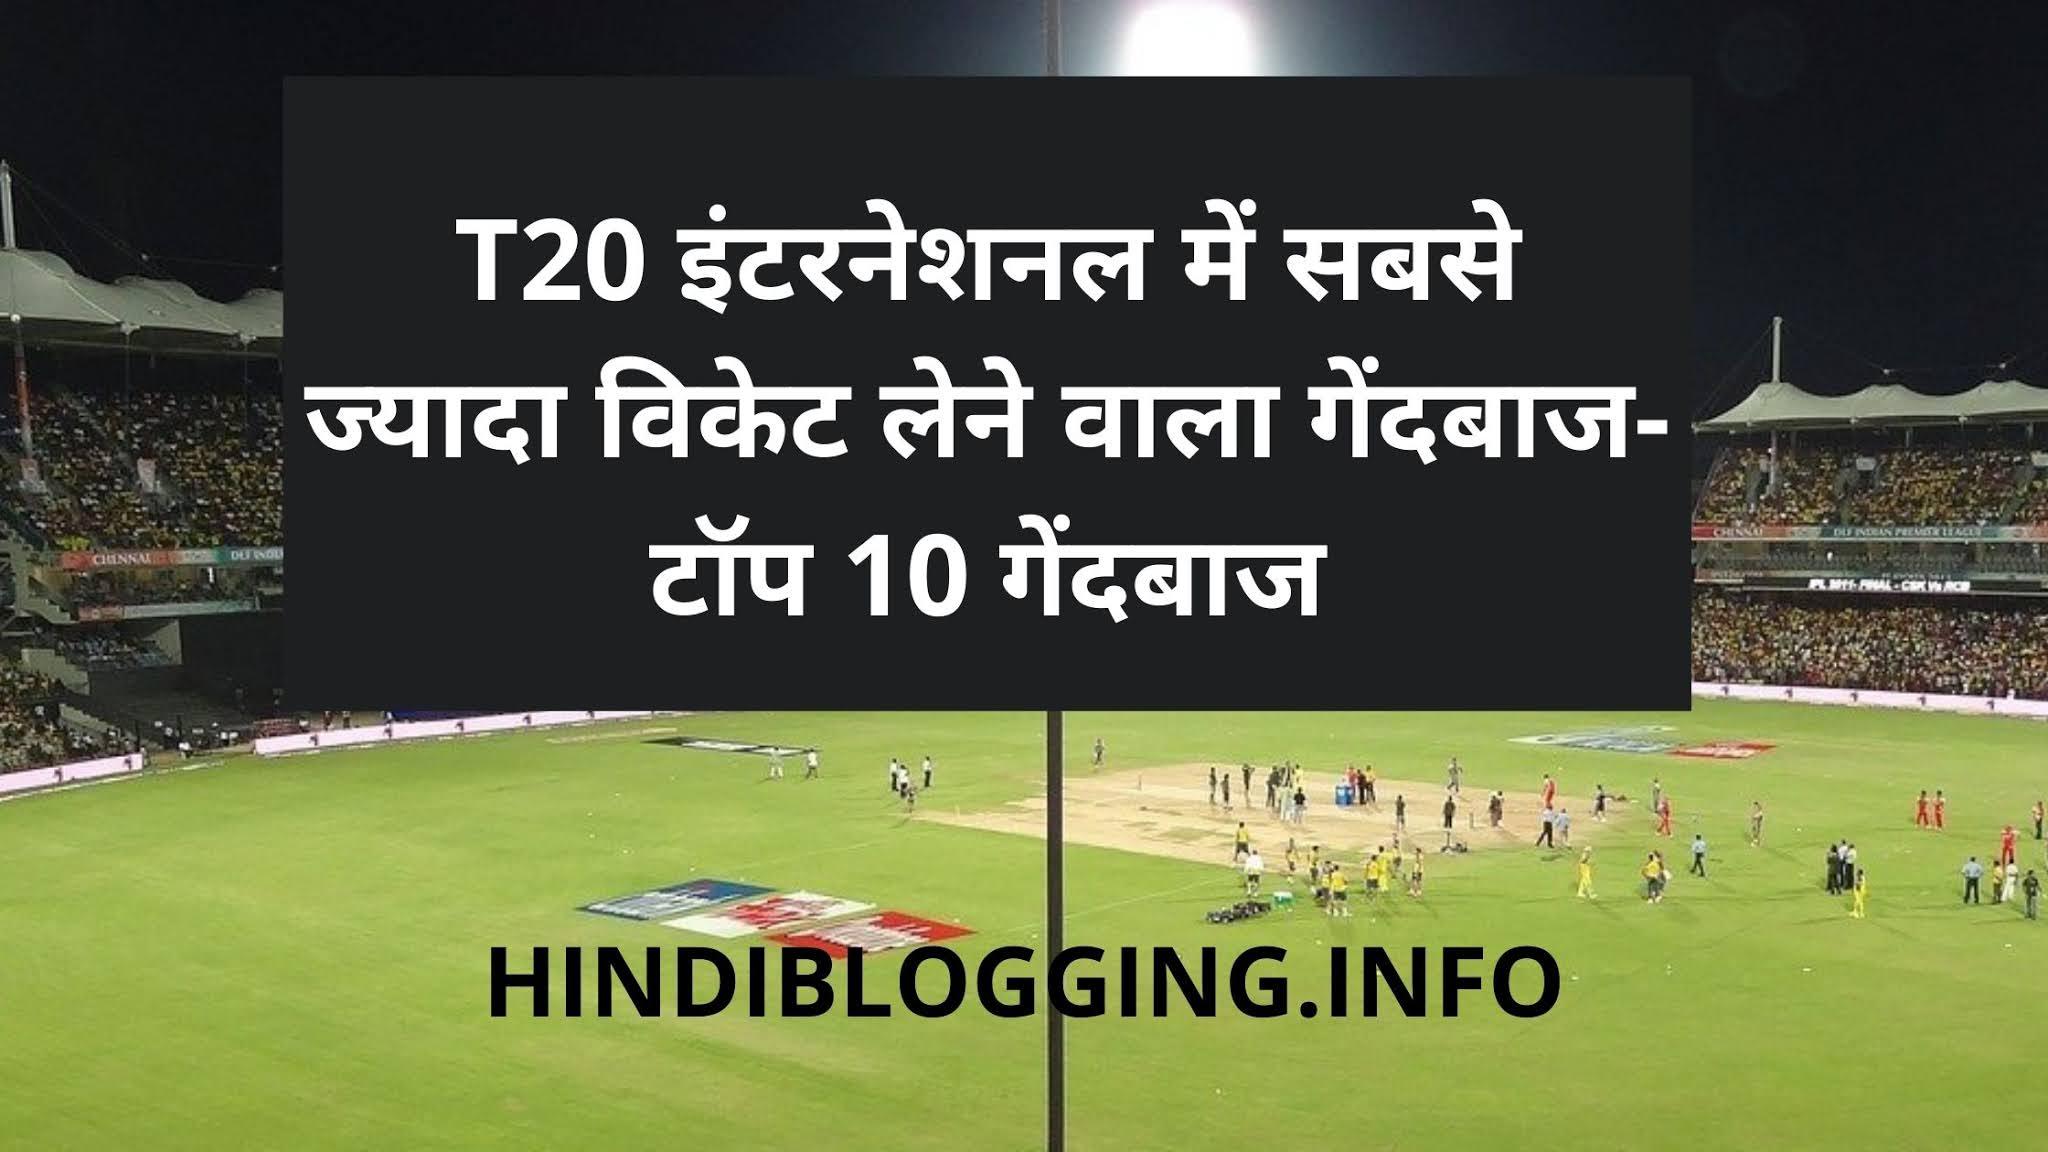 T20 international me sabse jyada wicket lene wala bowler